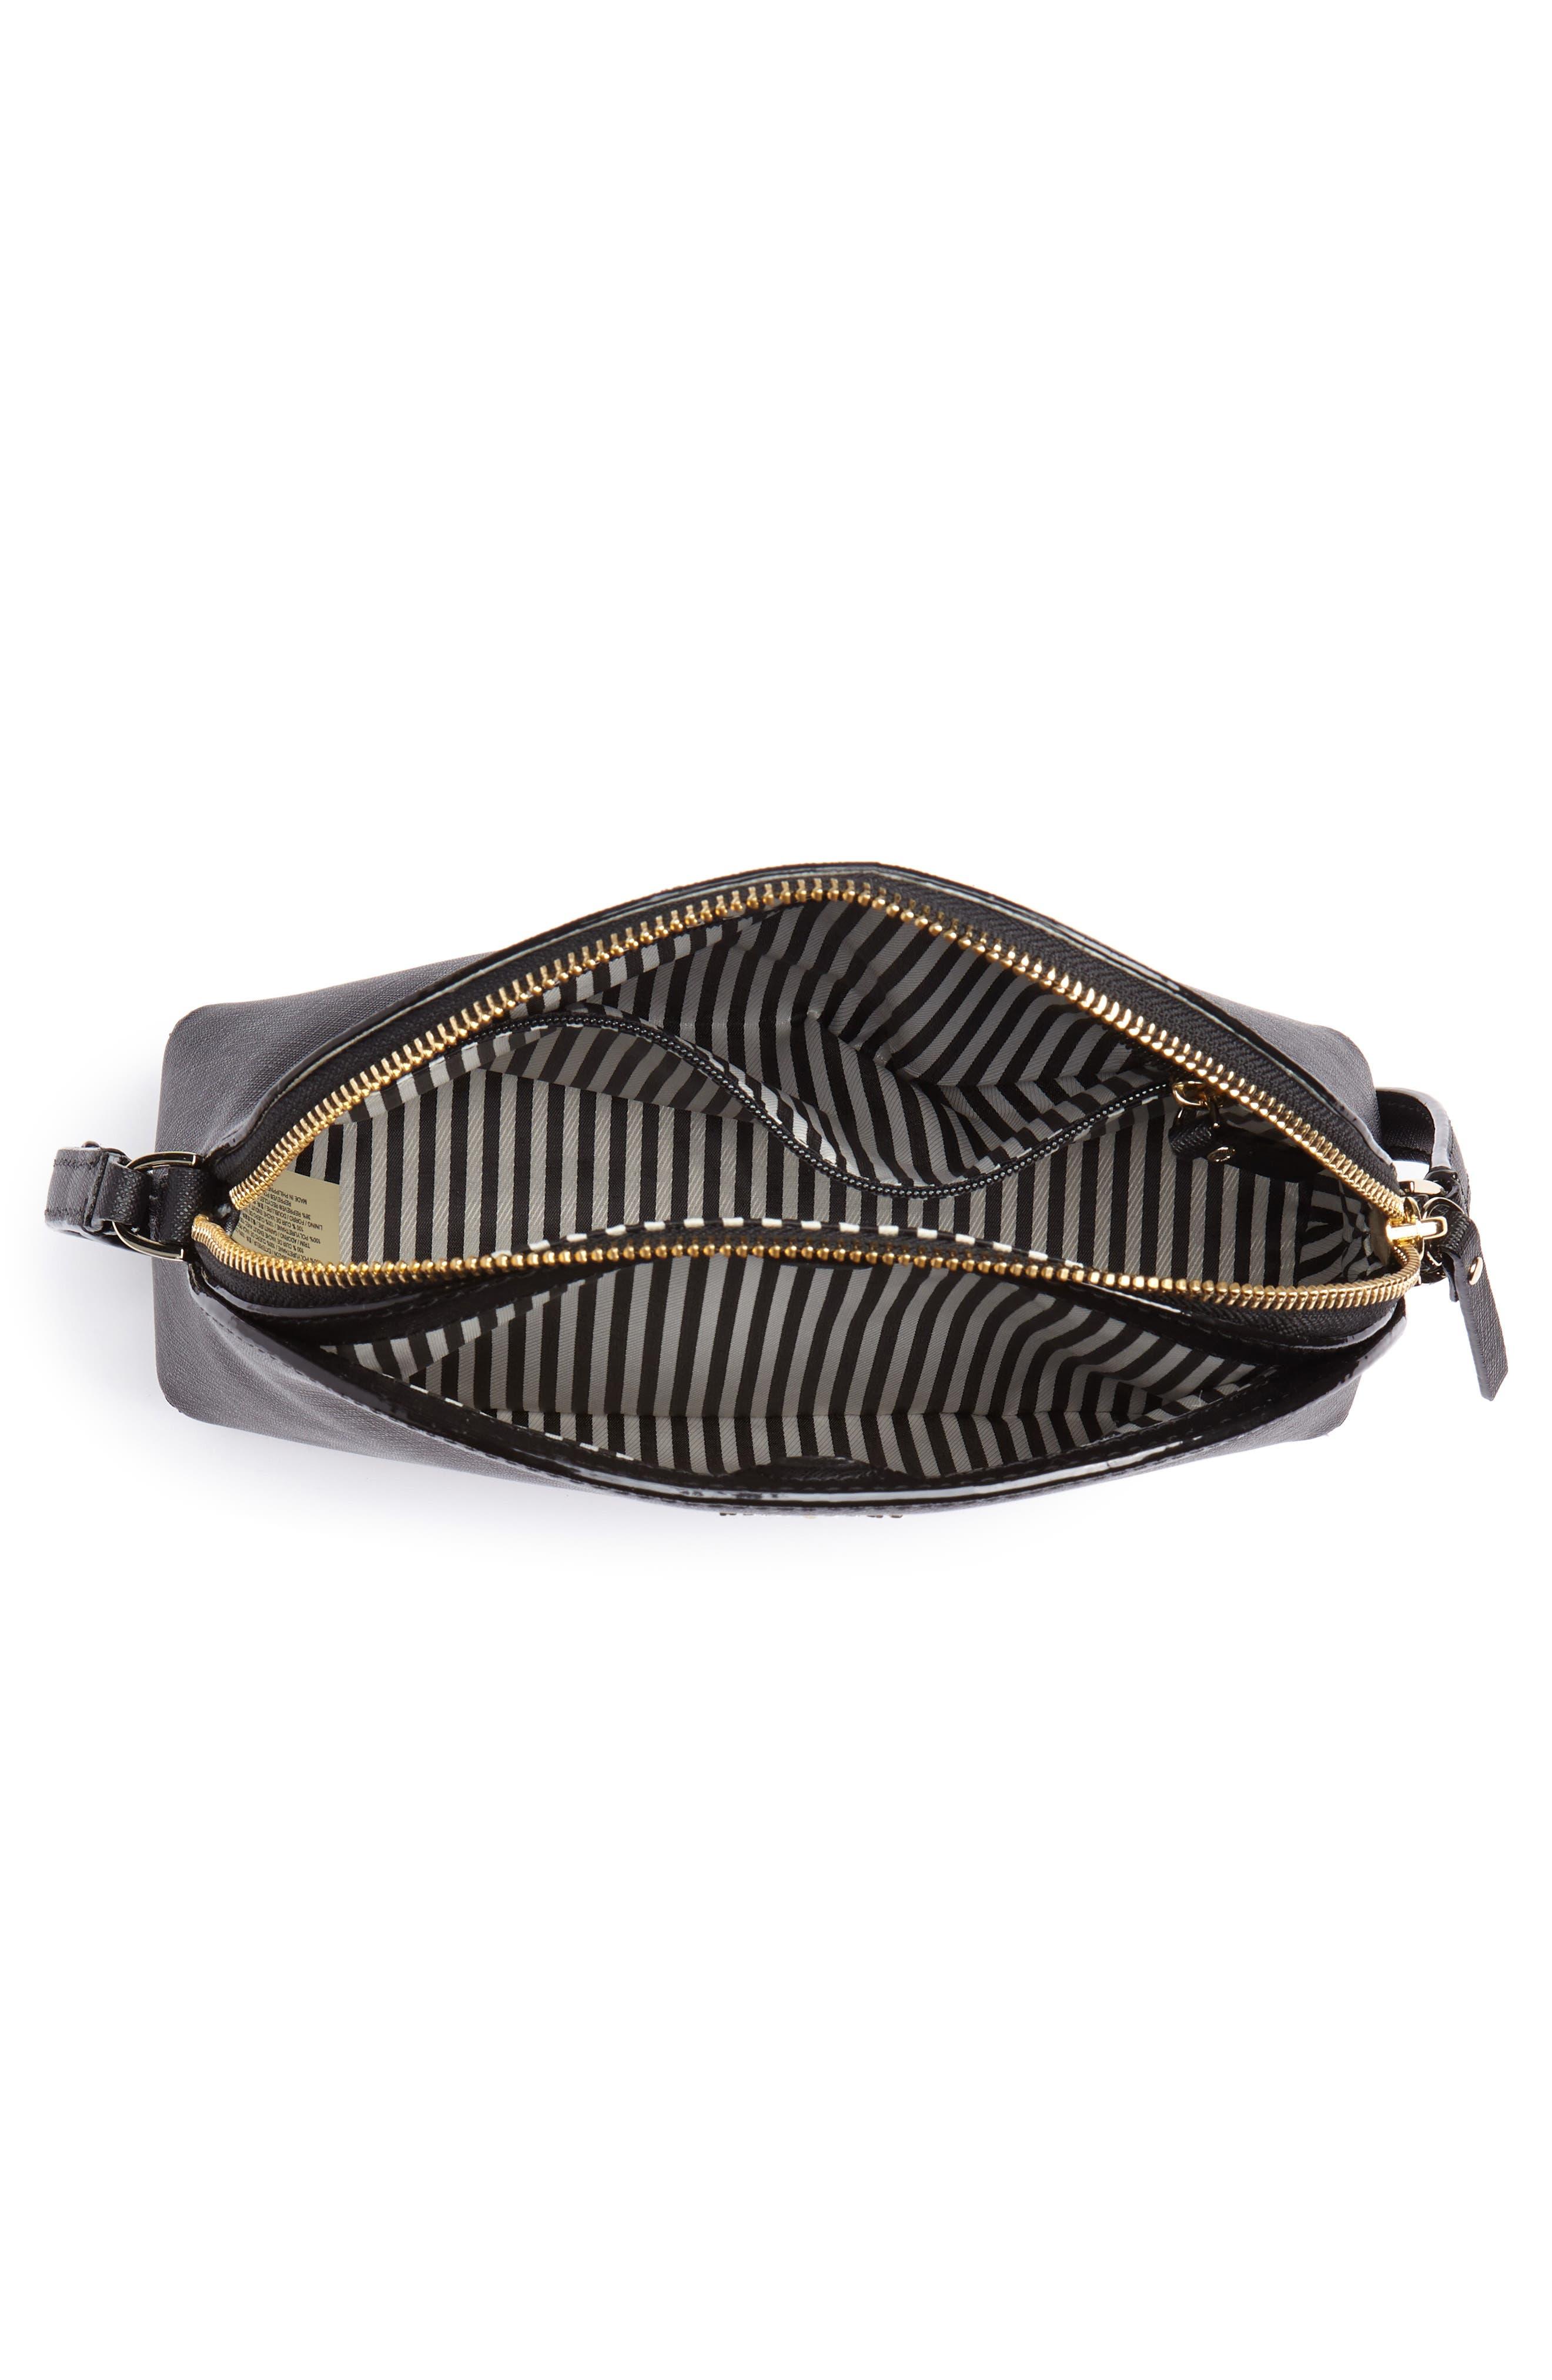 KATE SPADE NEW YORK, cameron street large hilli leather crossbody bag, Alternate thumbnail 4, color, 001